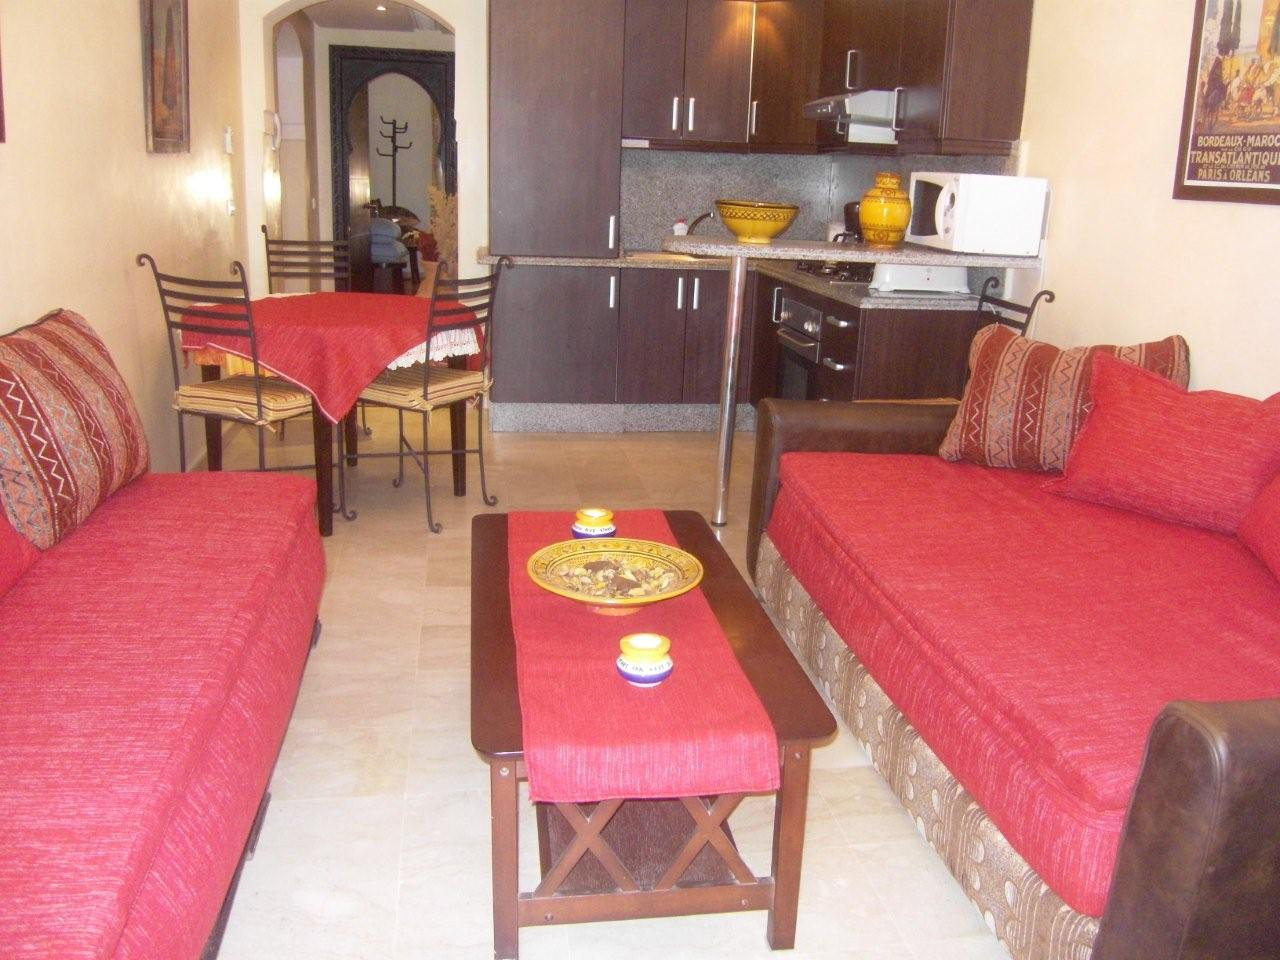 Verkoop 2 slaapkamers marrakech marrakech marokko rue du capitaine arrigui - Slaapkamer marokko ...